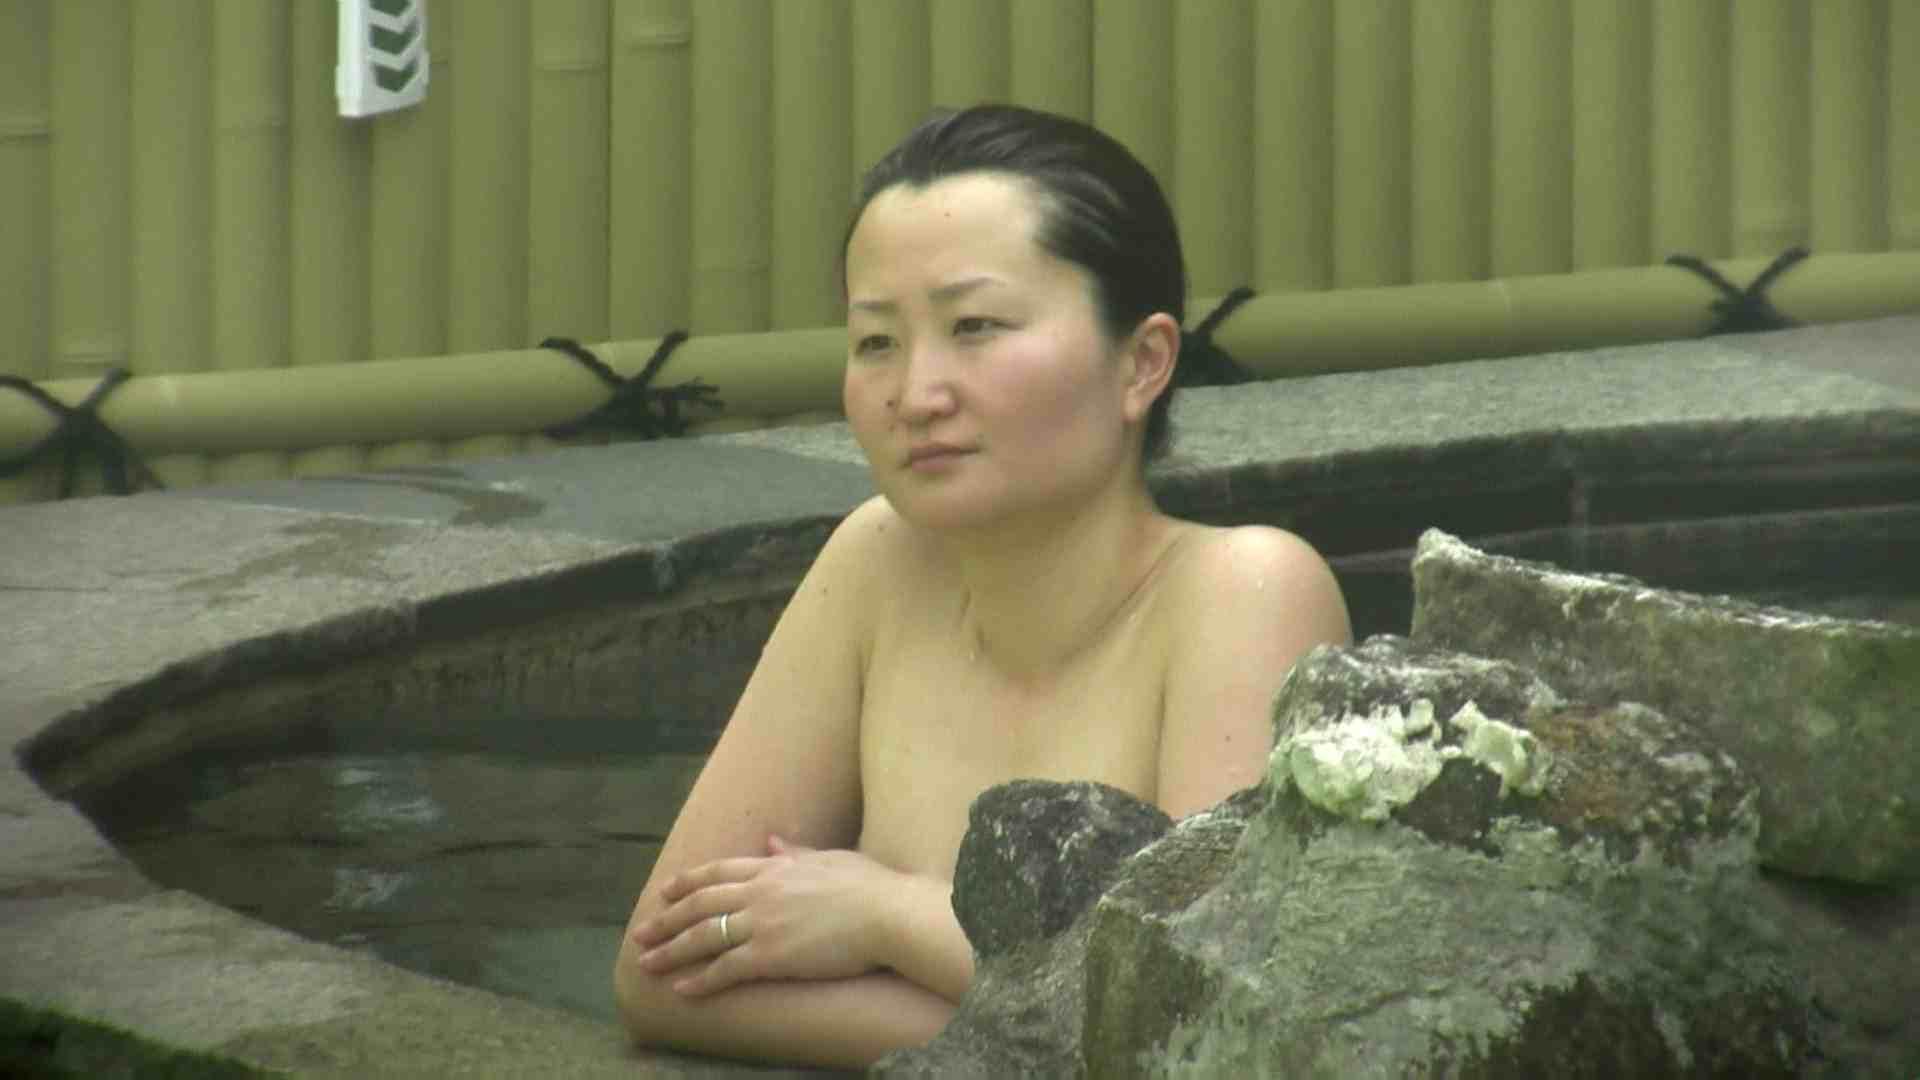 Aquaな露天風呂Vol.632 露天 戯れ無修正画像 70画像 11